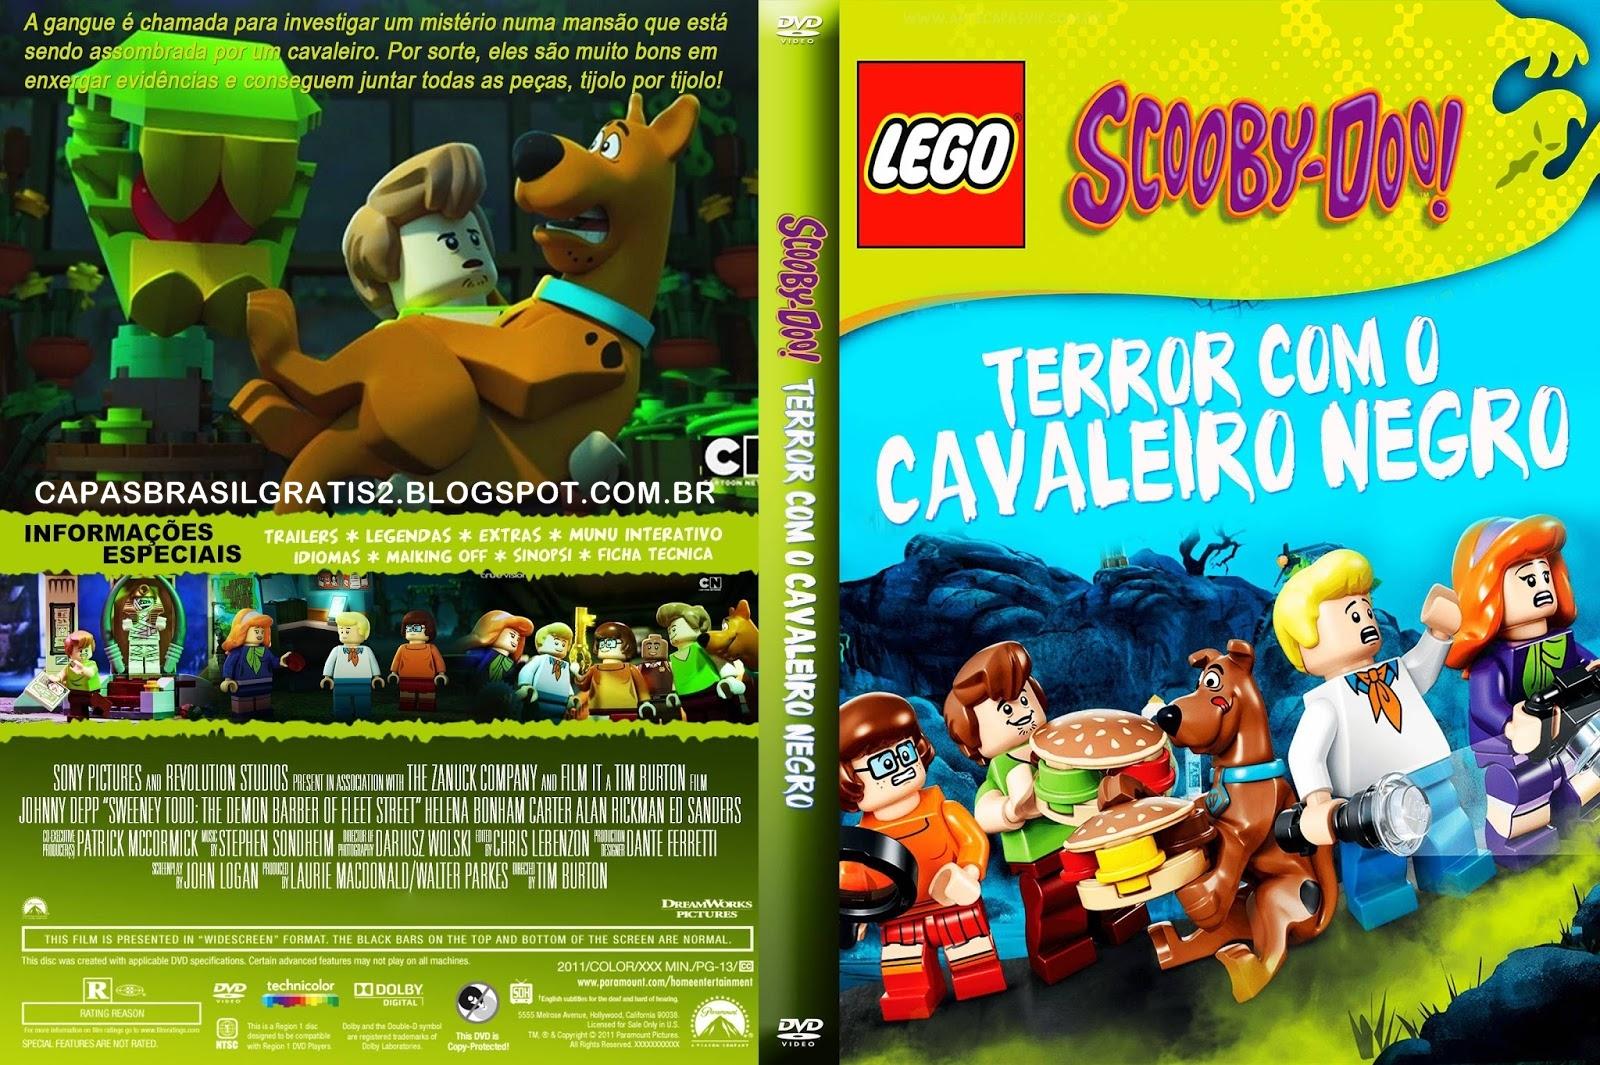 https://3.bp.blogspot.com/-xkqyrGRifFA/V21YC_aw15I/AAAAAAAAYeA/svI7vxT36x8HbDmn70vCaOKdMXoXhHShwCLcB/s1600/Lego%2BScooby-Doo%2BTerror%2BCom%2BO%2BCavaleiro%2BNegro.jpg